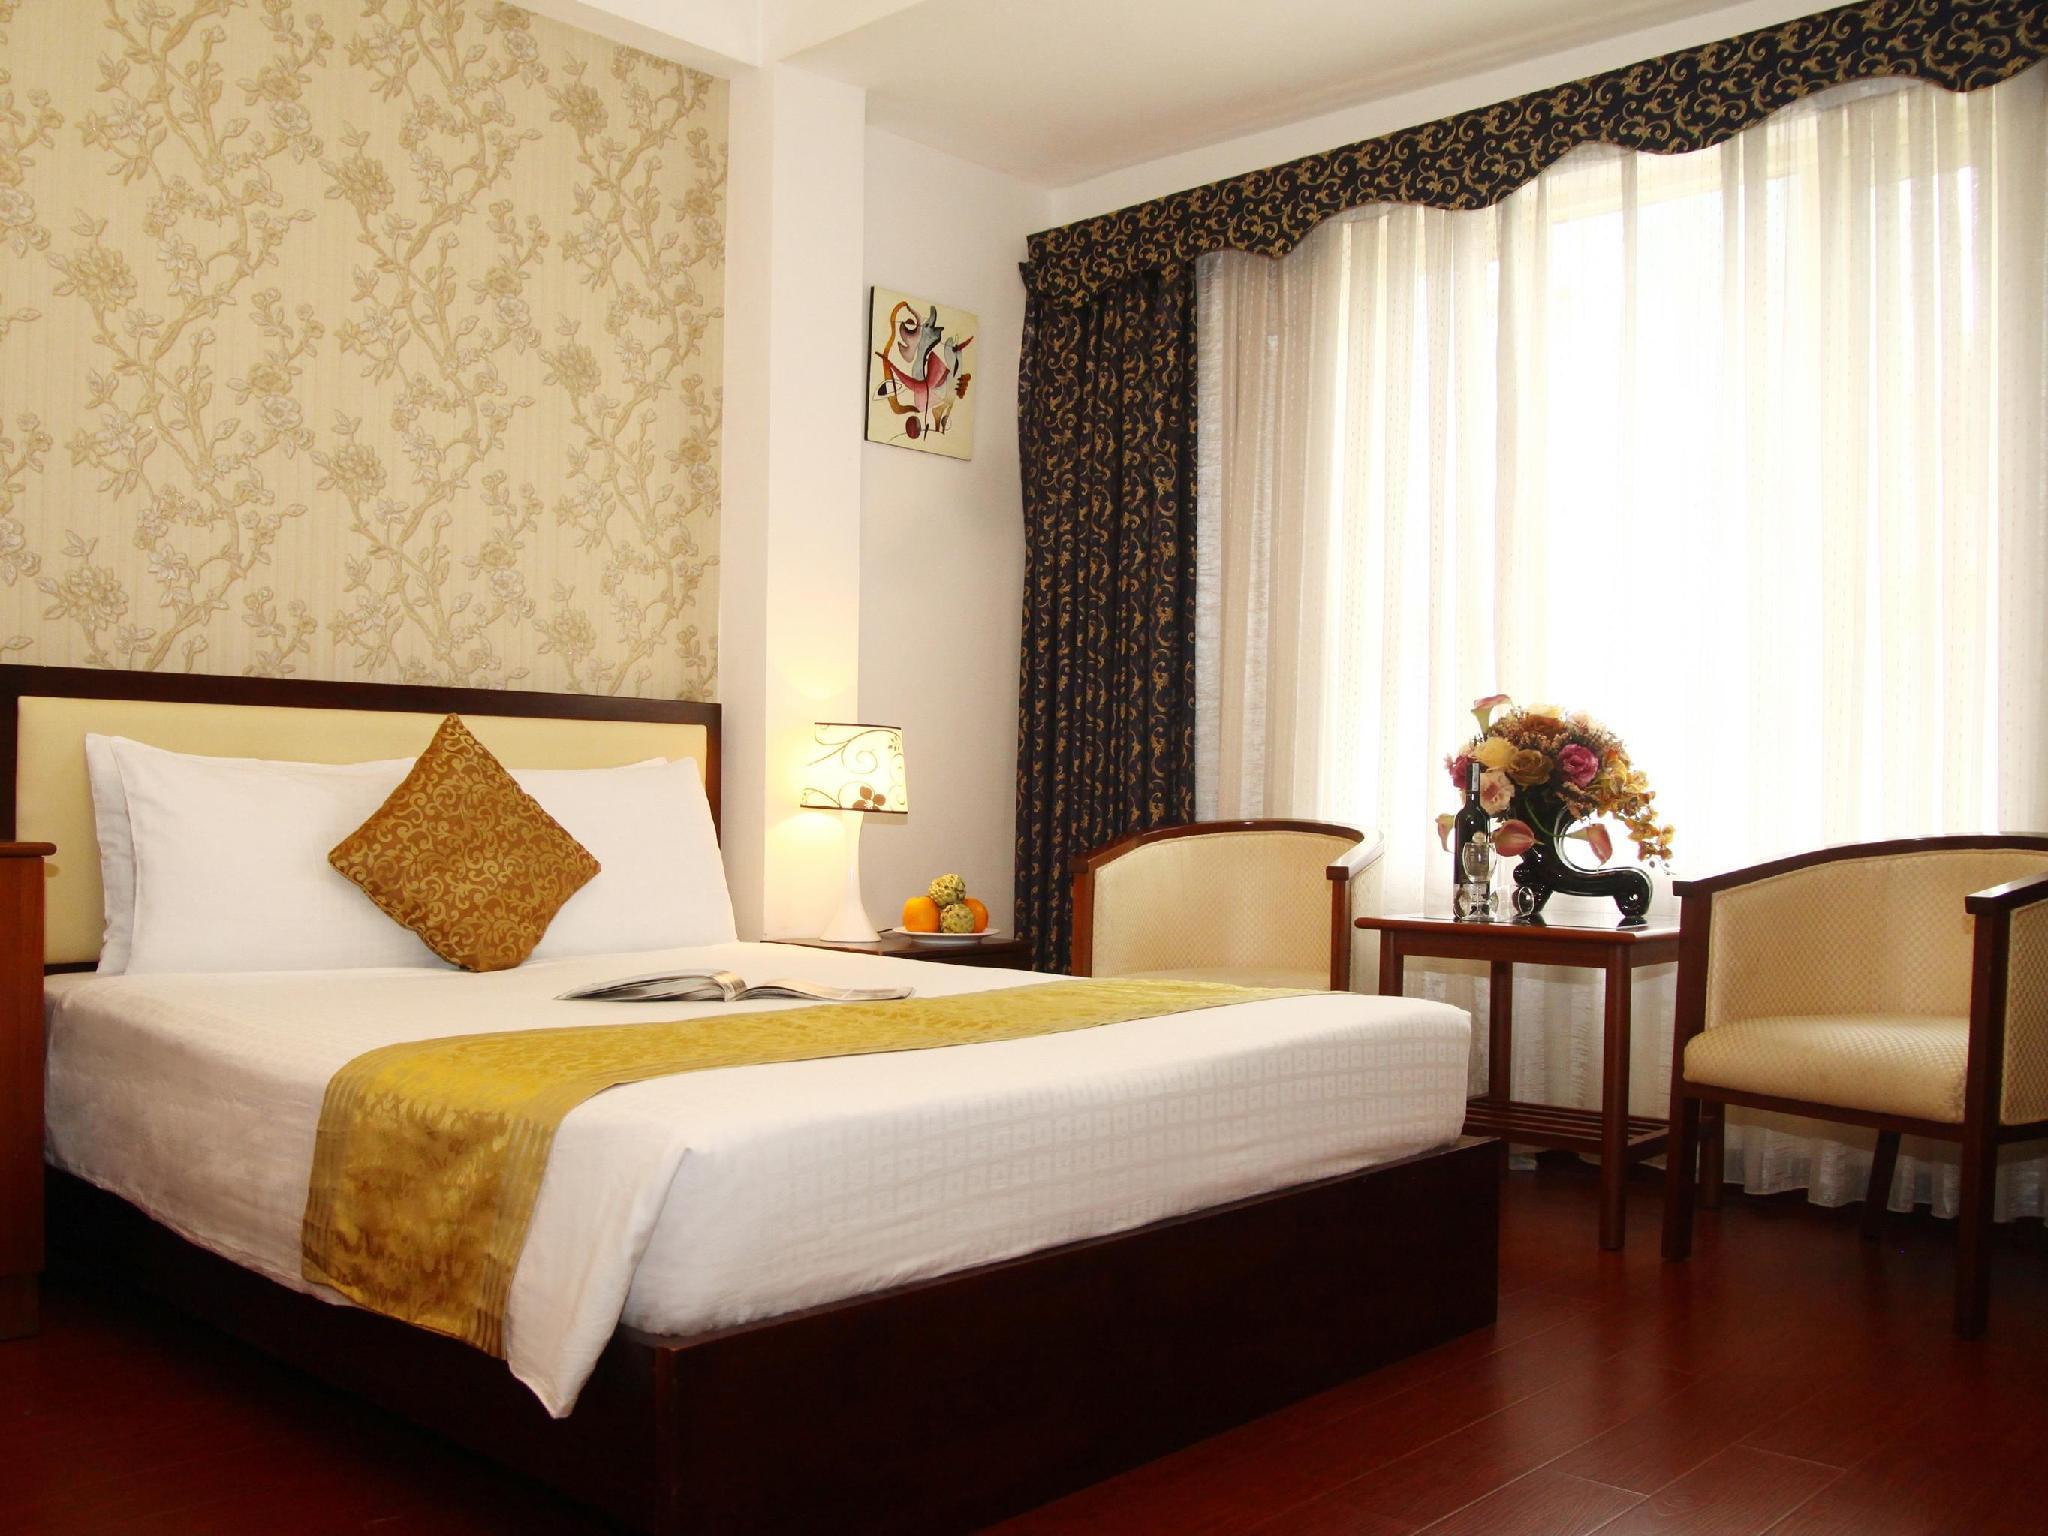 M M Hotel - Bui Thi Xuan Street - Hotell och Boende i Vietnam , Ho Chi Minh City